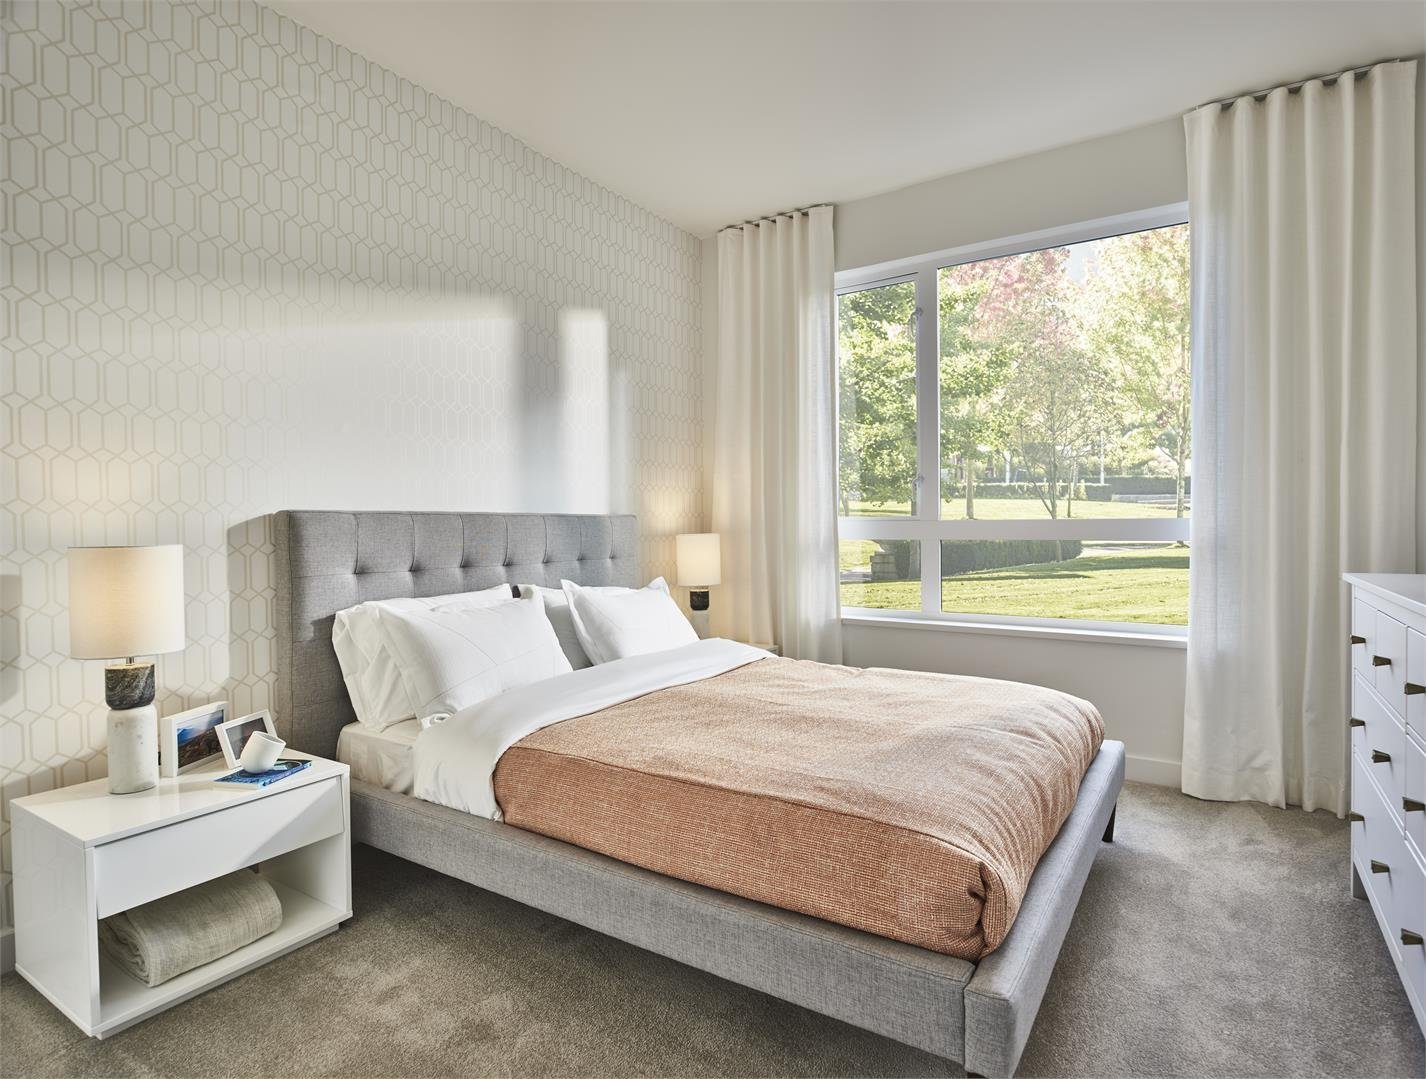 HQ Display Master Bedroom!